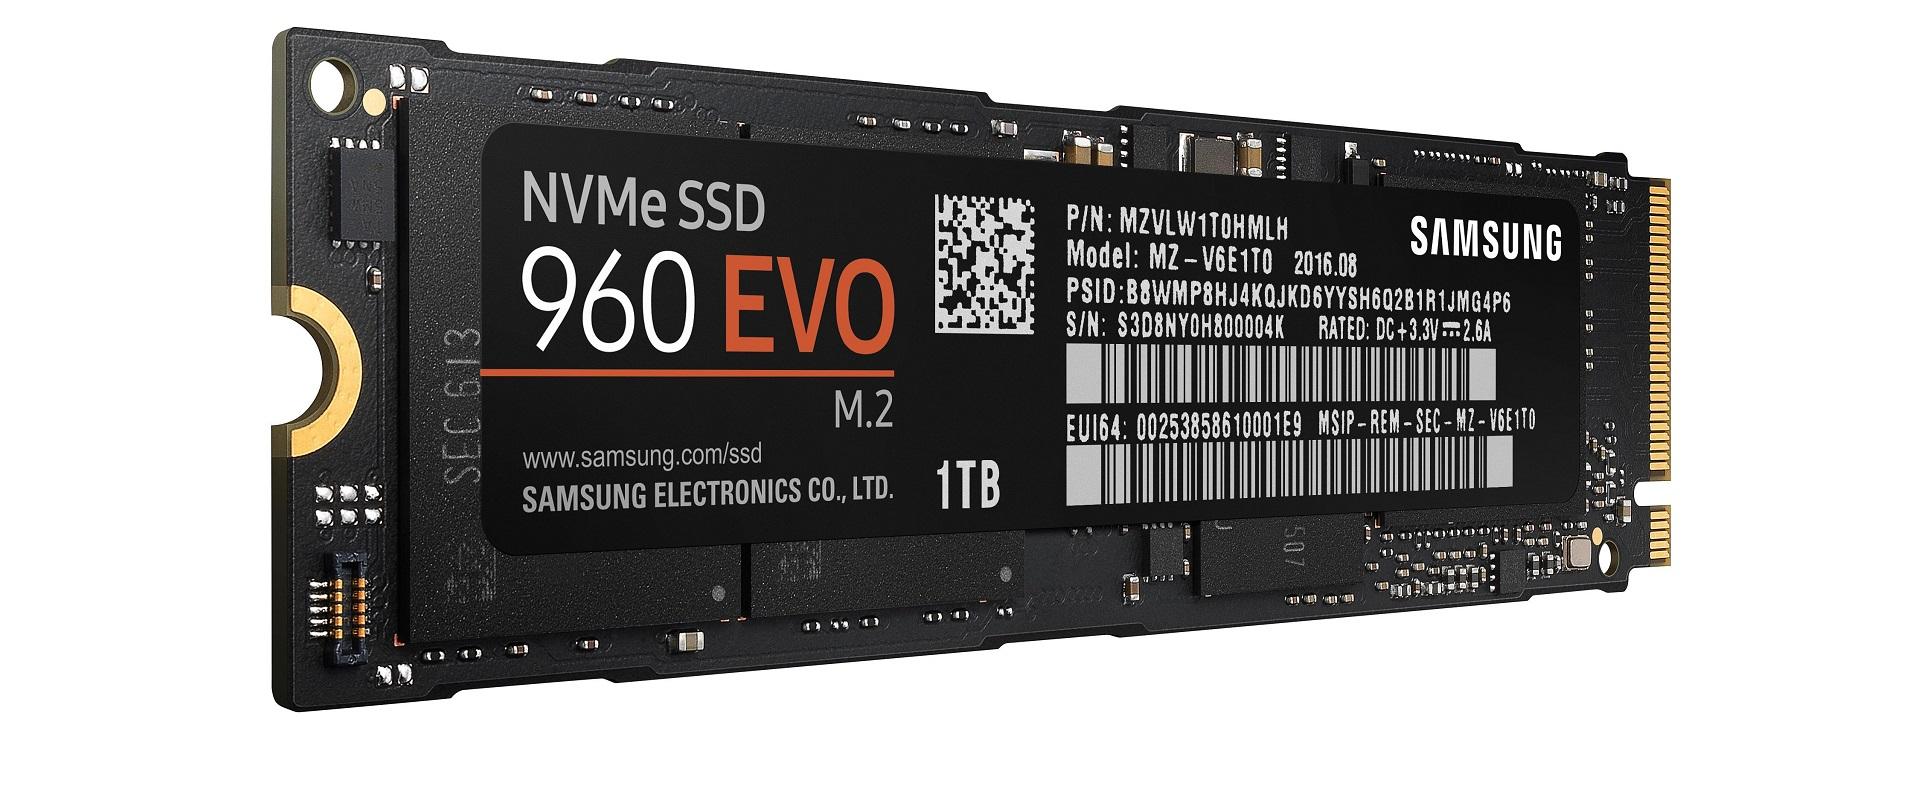 SAMSUNG 960 PRO M.2 1TB – Đánh Giá Gaming Gear